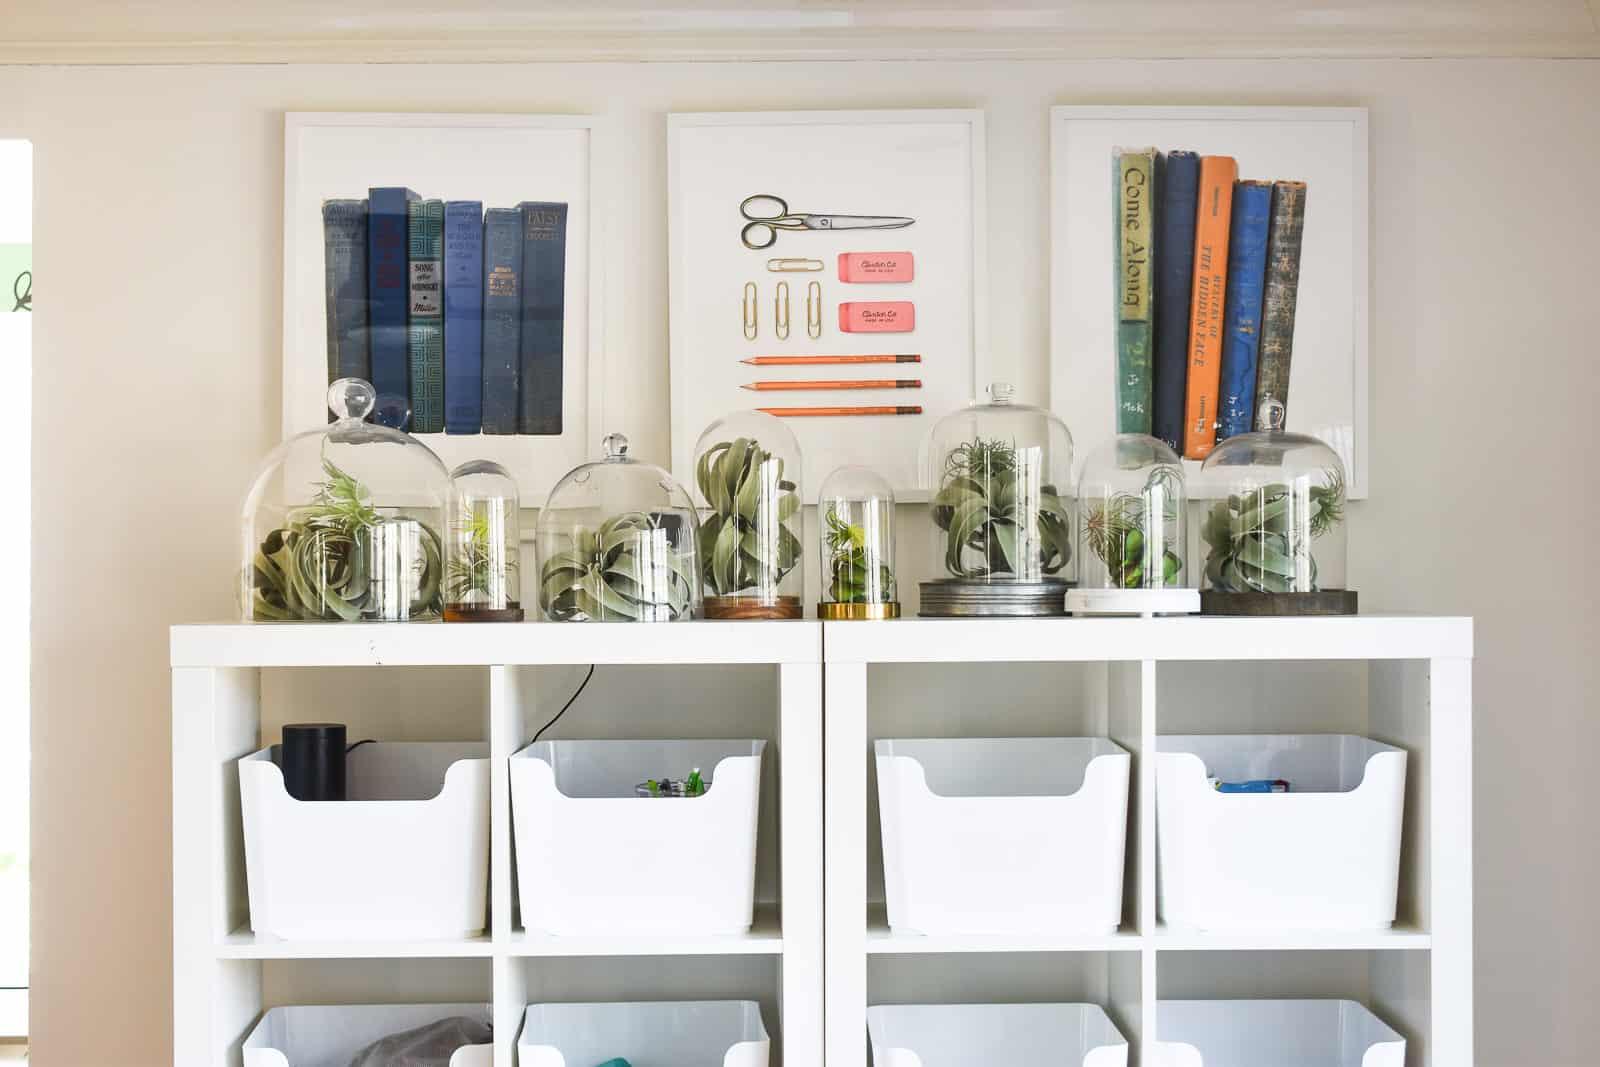 minted prints above the storage shelf